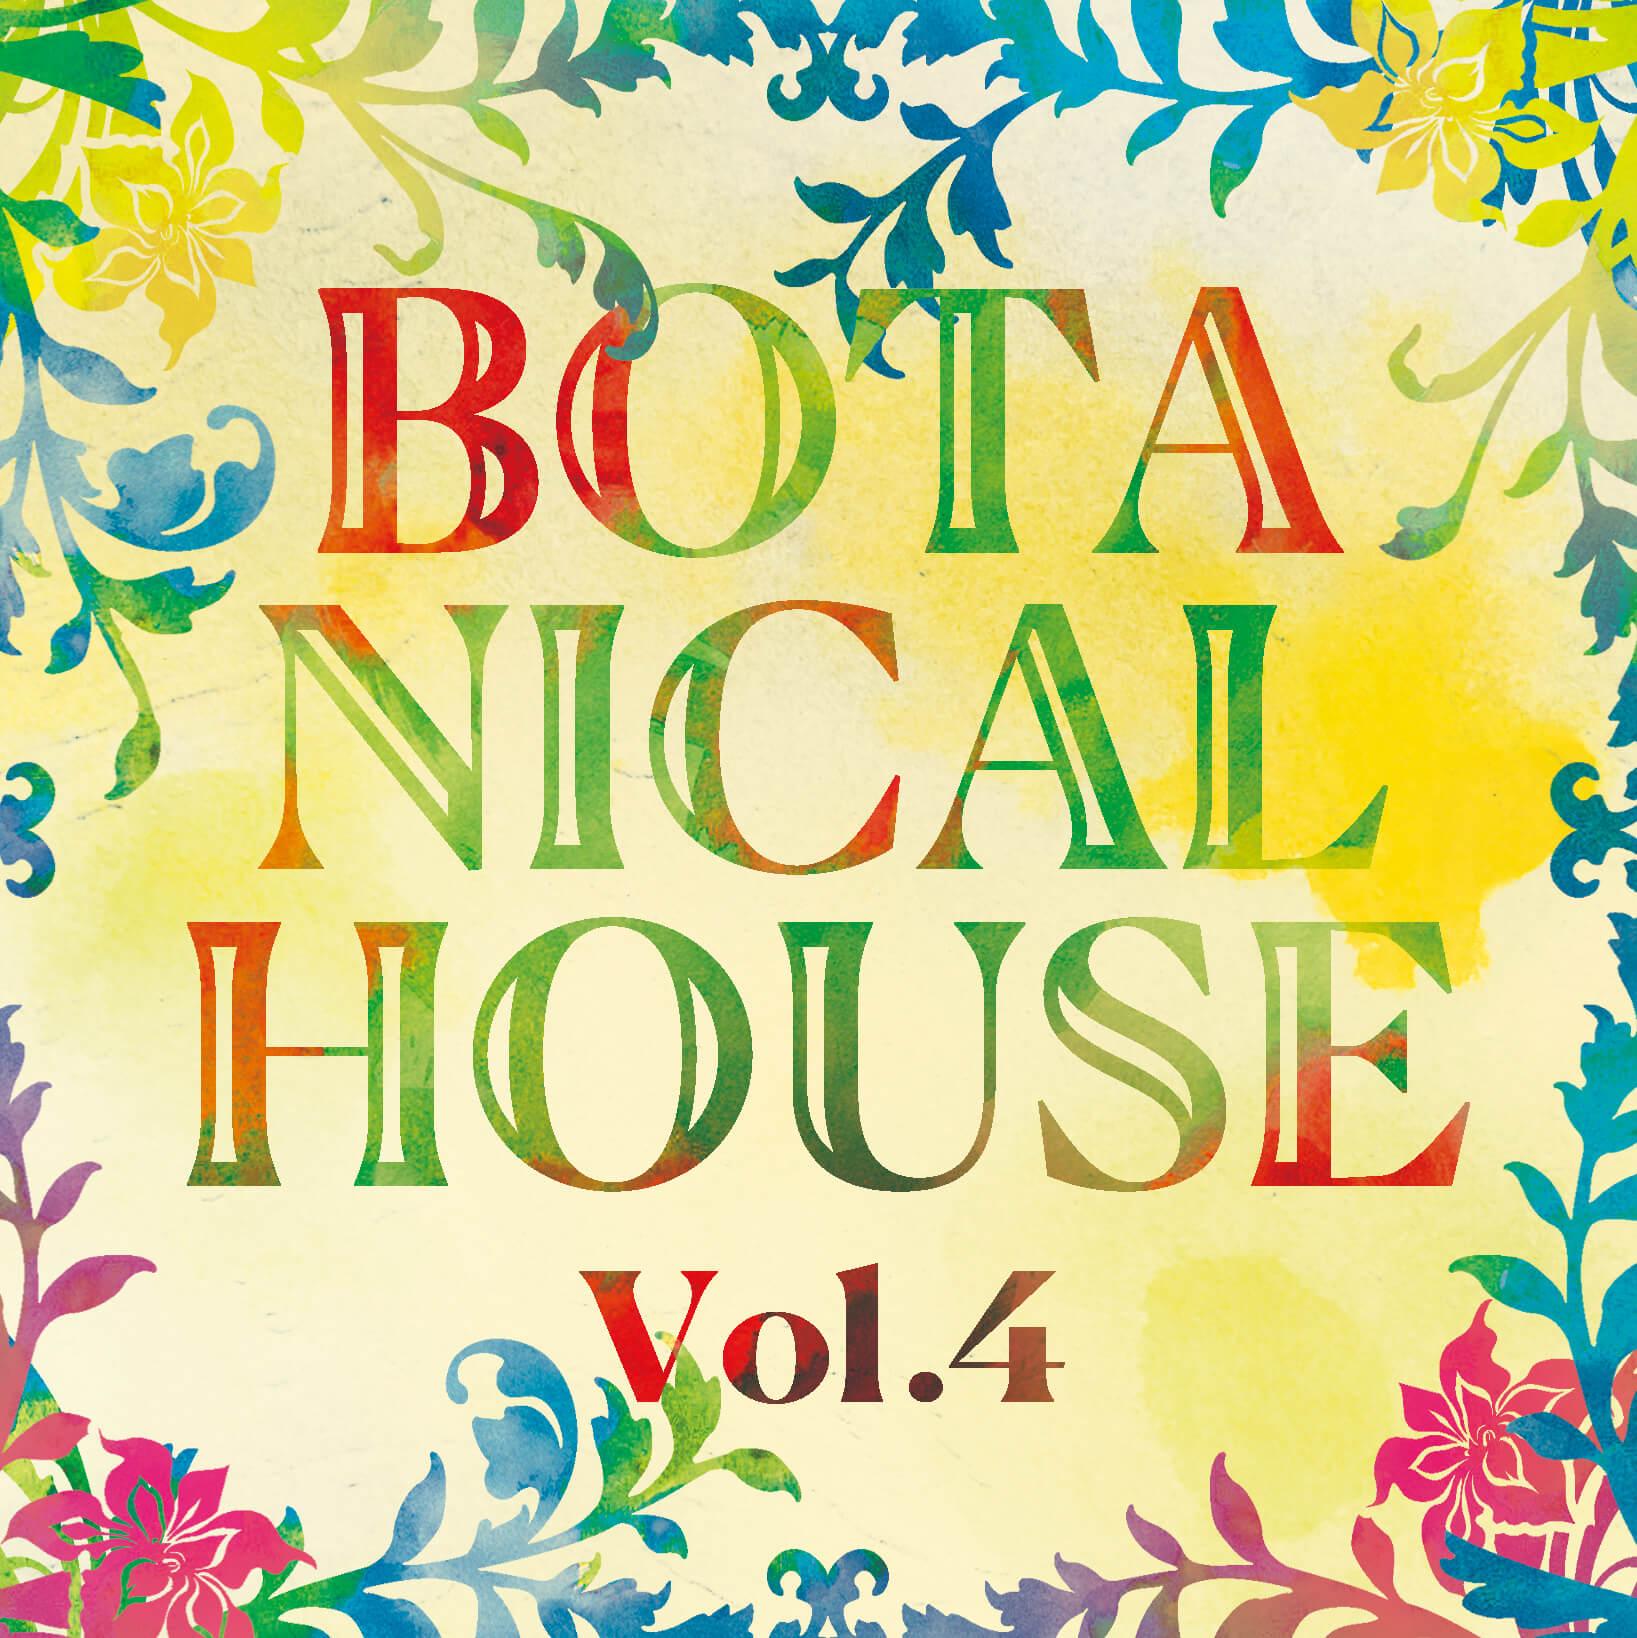 Botanical House Vol.4 ~新春スペシャル~ 出演者決定!  豊田道倫 & mtvBAND / 夏目知幸(シャムキャッツ)/ 澤部渡(スカート)/ Homecomings